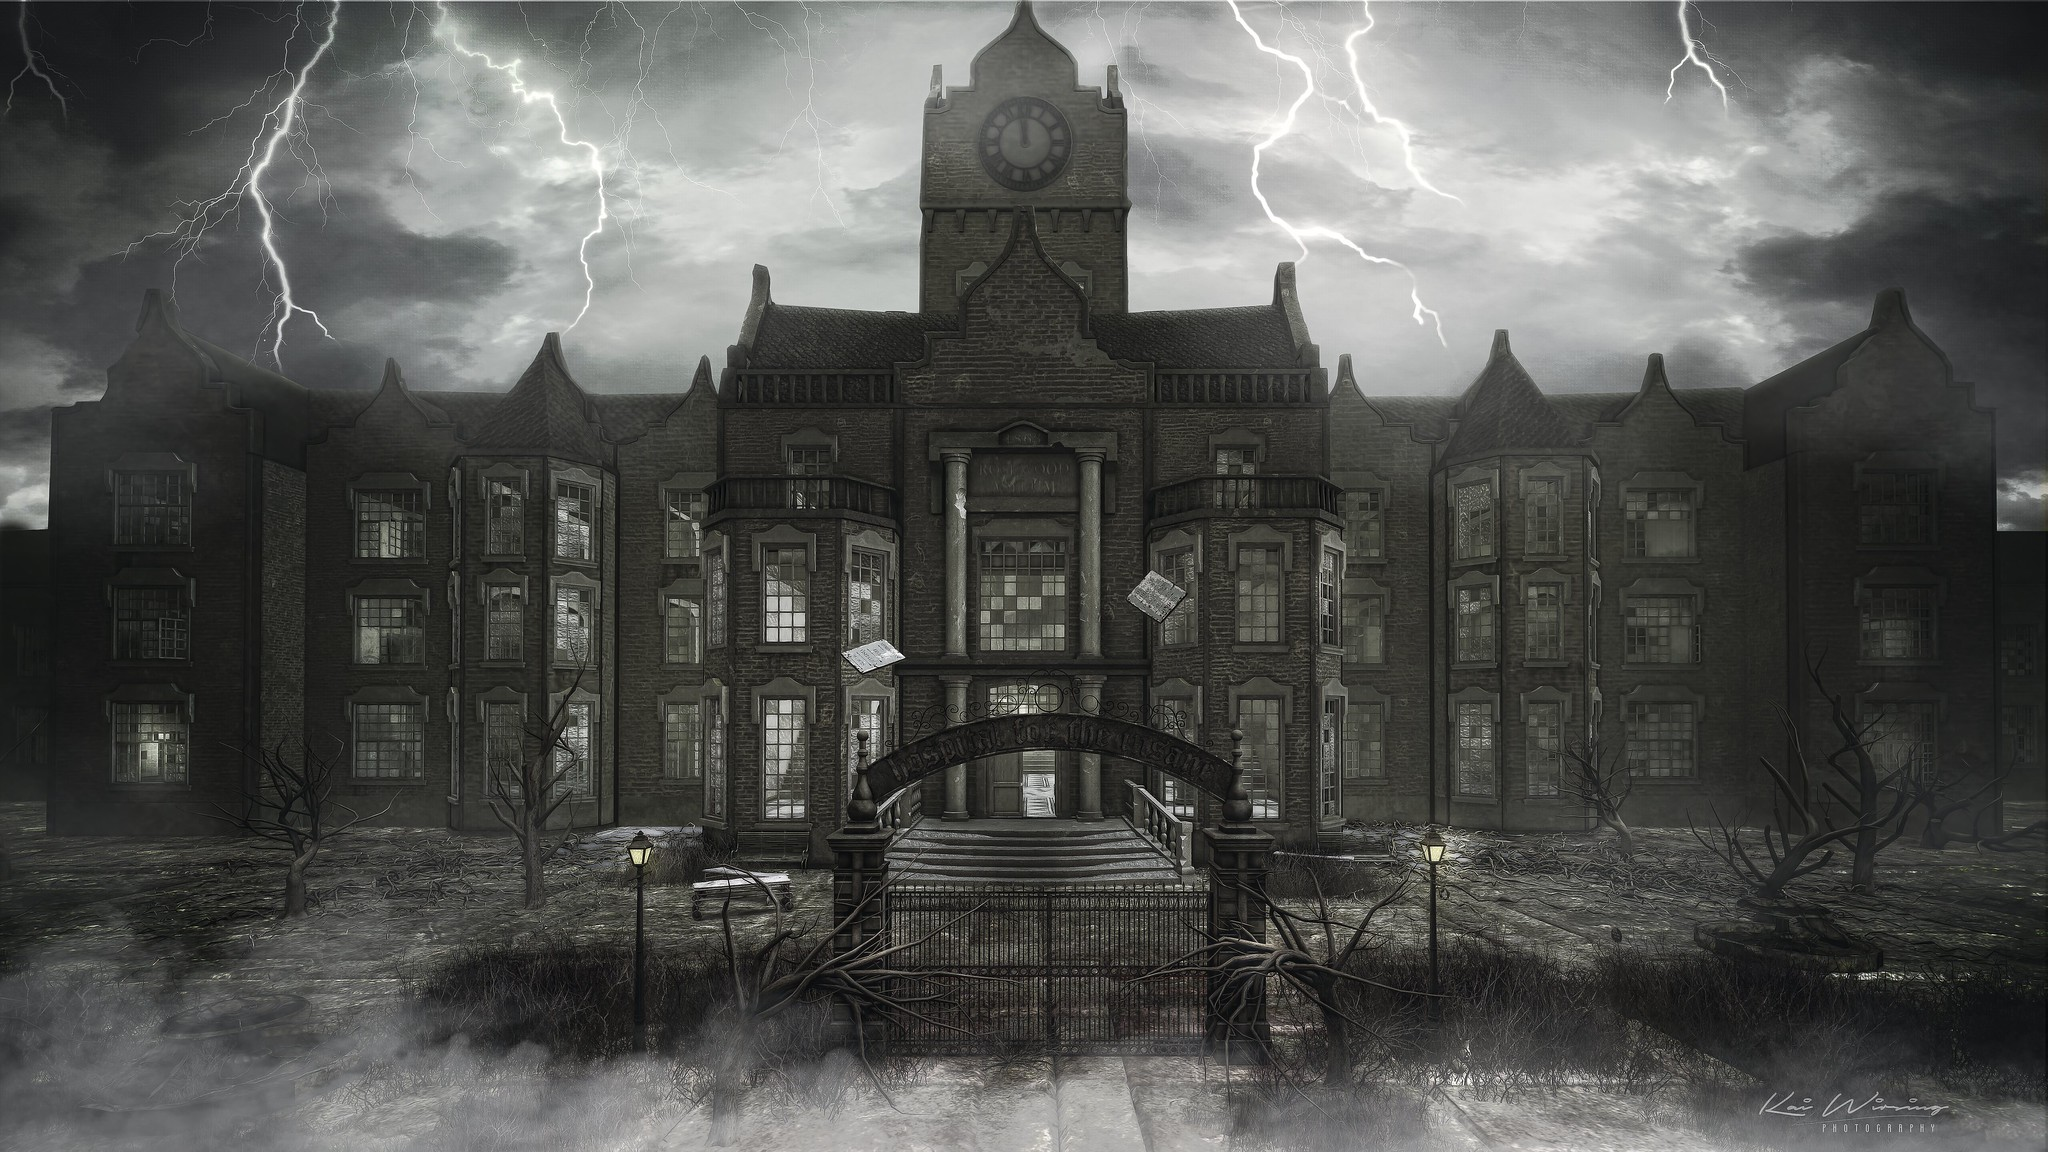 Rosewood Asylum